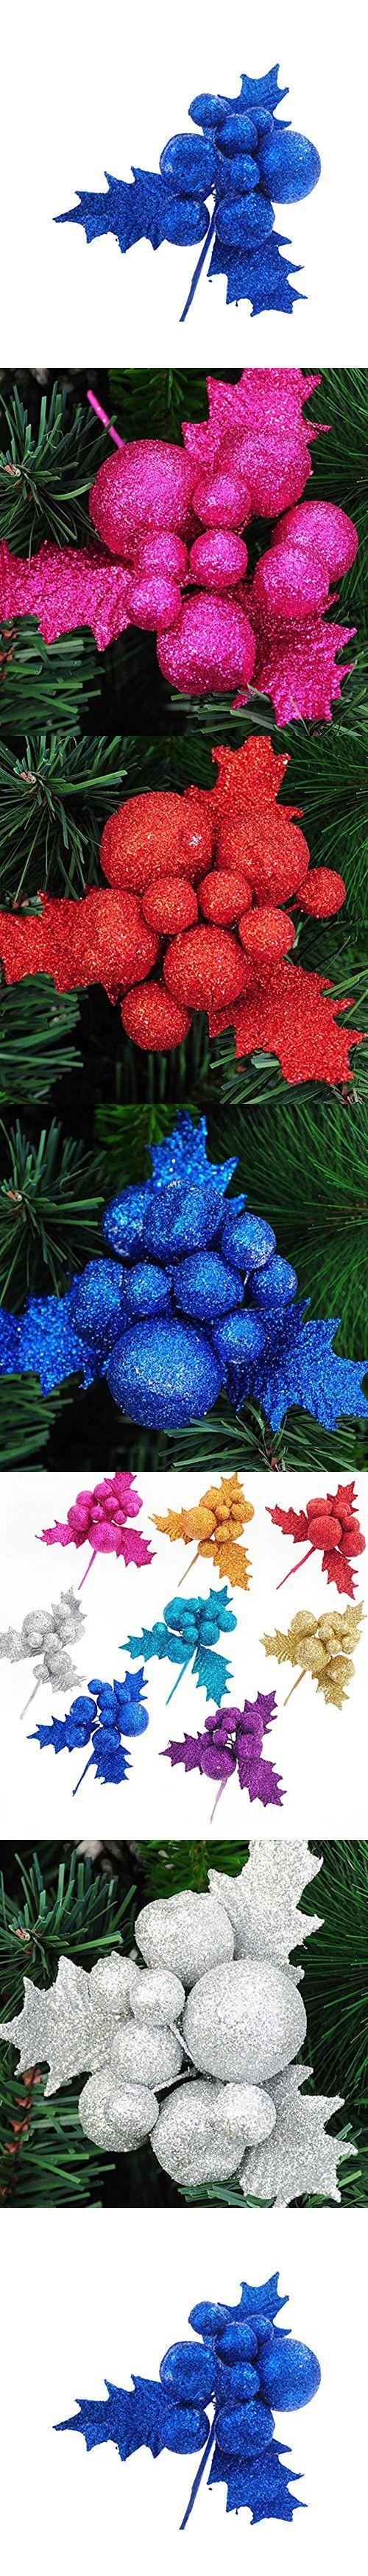 Deercon Glitter Artificial Wedding Christmas Leaves Baubles XMAS Tree Wreaths Decor Ornament(Blue)